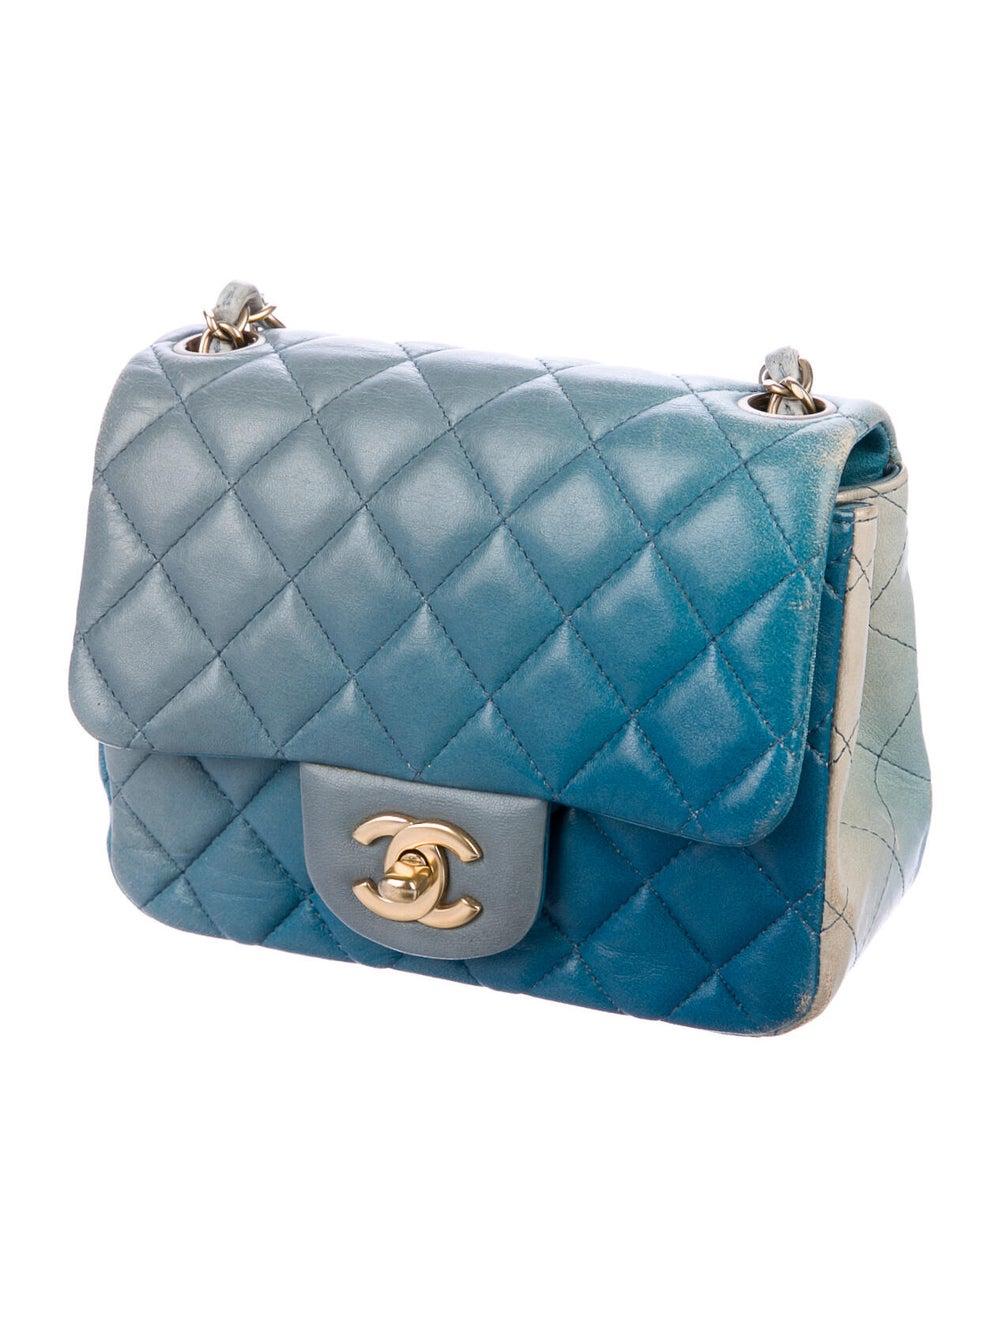 Chanel Classic Degradé Mini Square Flap Bag Blue - image 3